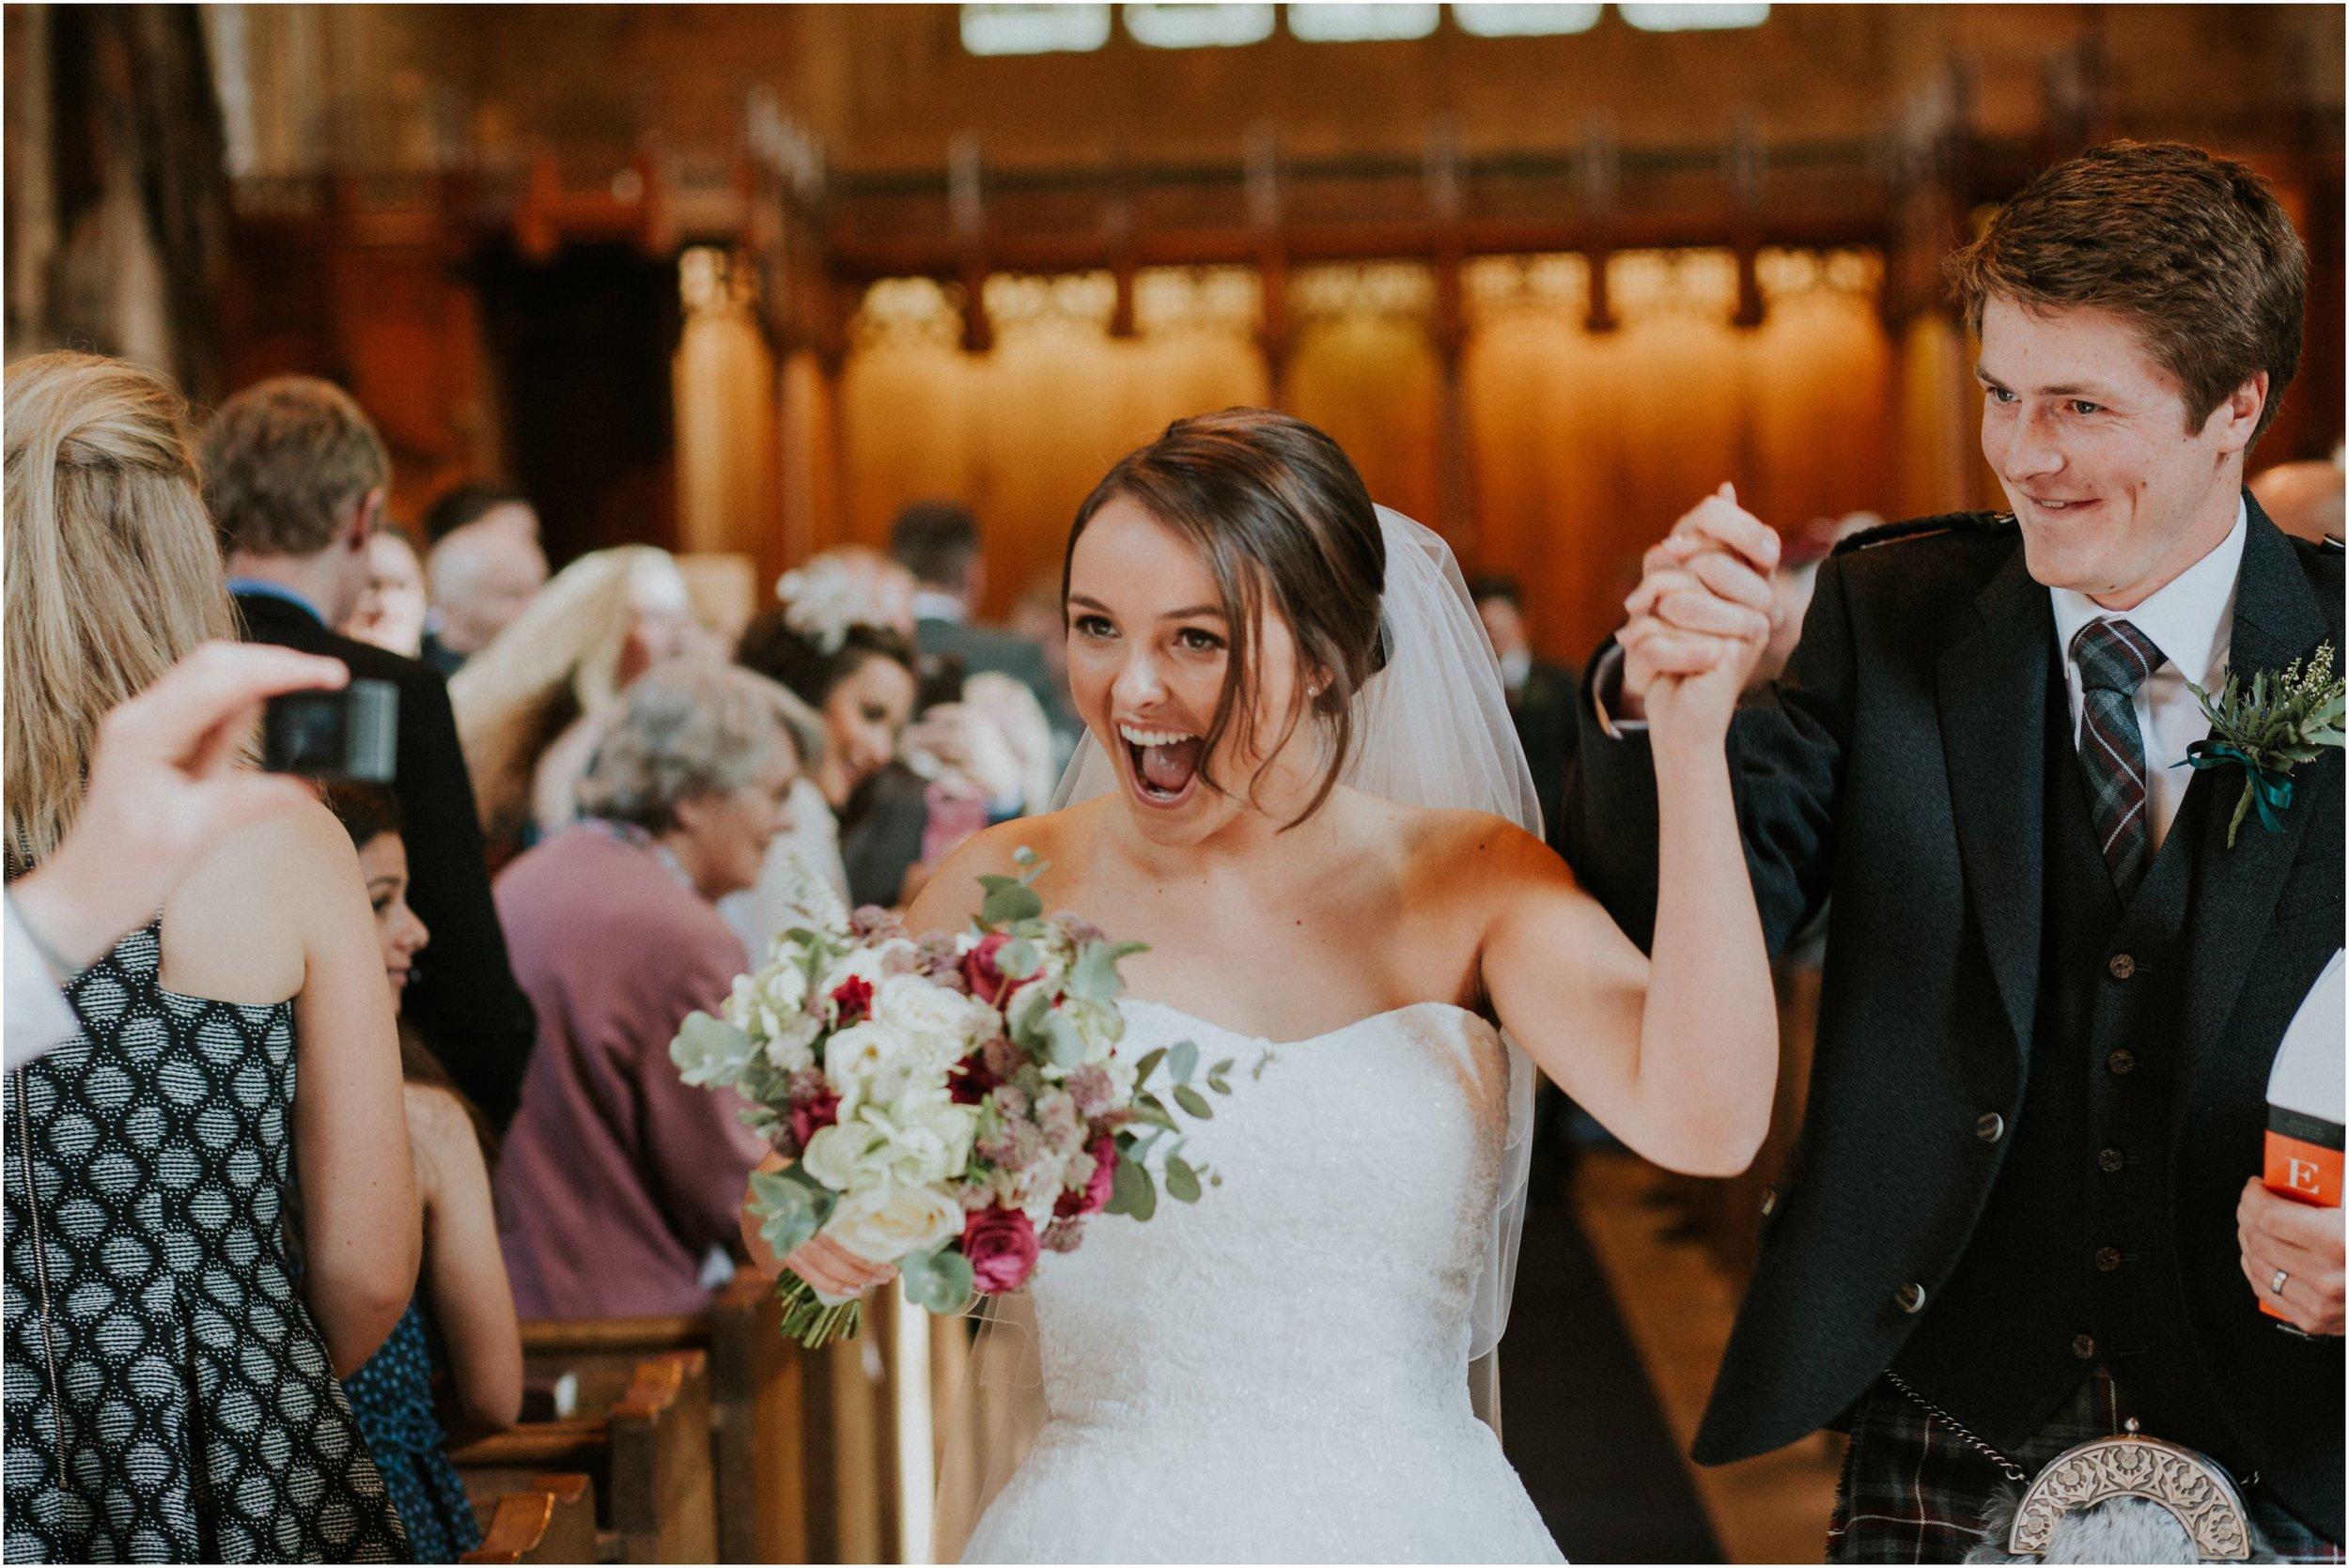 Photography 78 - Glasgow Wedding Photographer - Year in Reveiw_0013.jpg